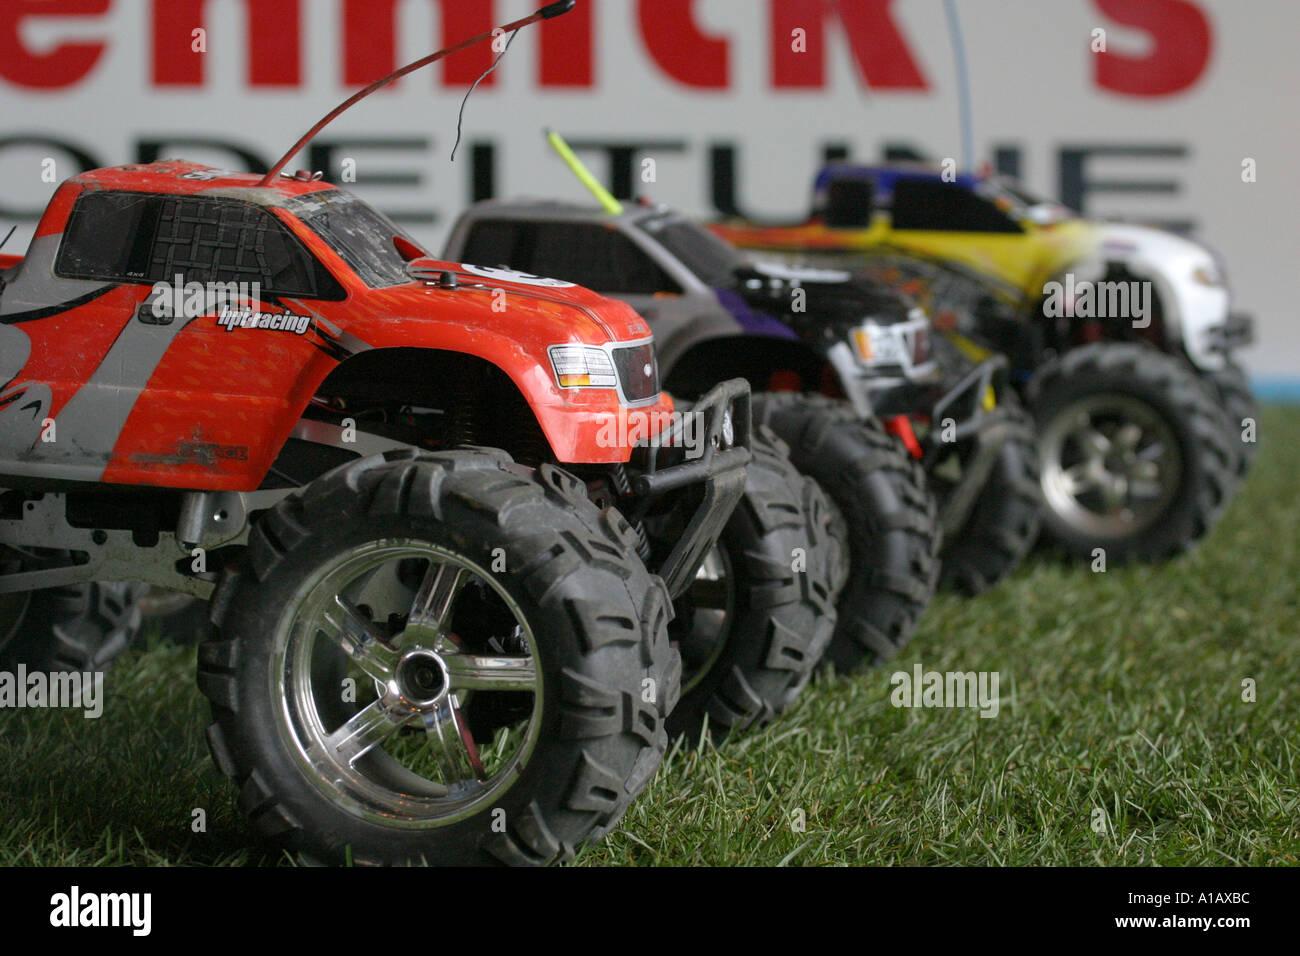 Radio control racing monster truck cars on grid on indoor grass track Belfast Northern Ireland - Stock Image